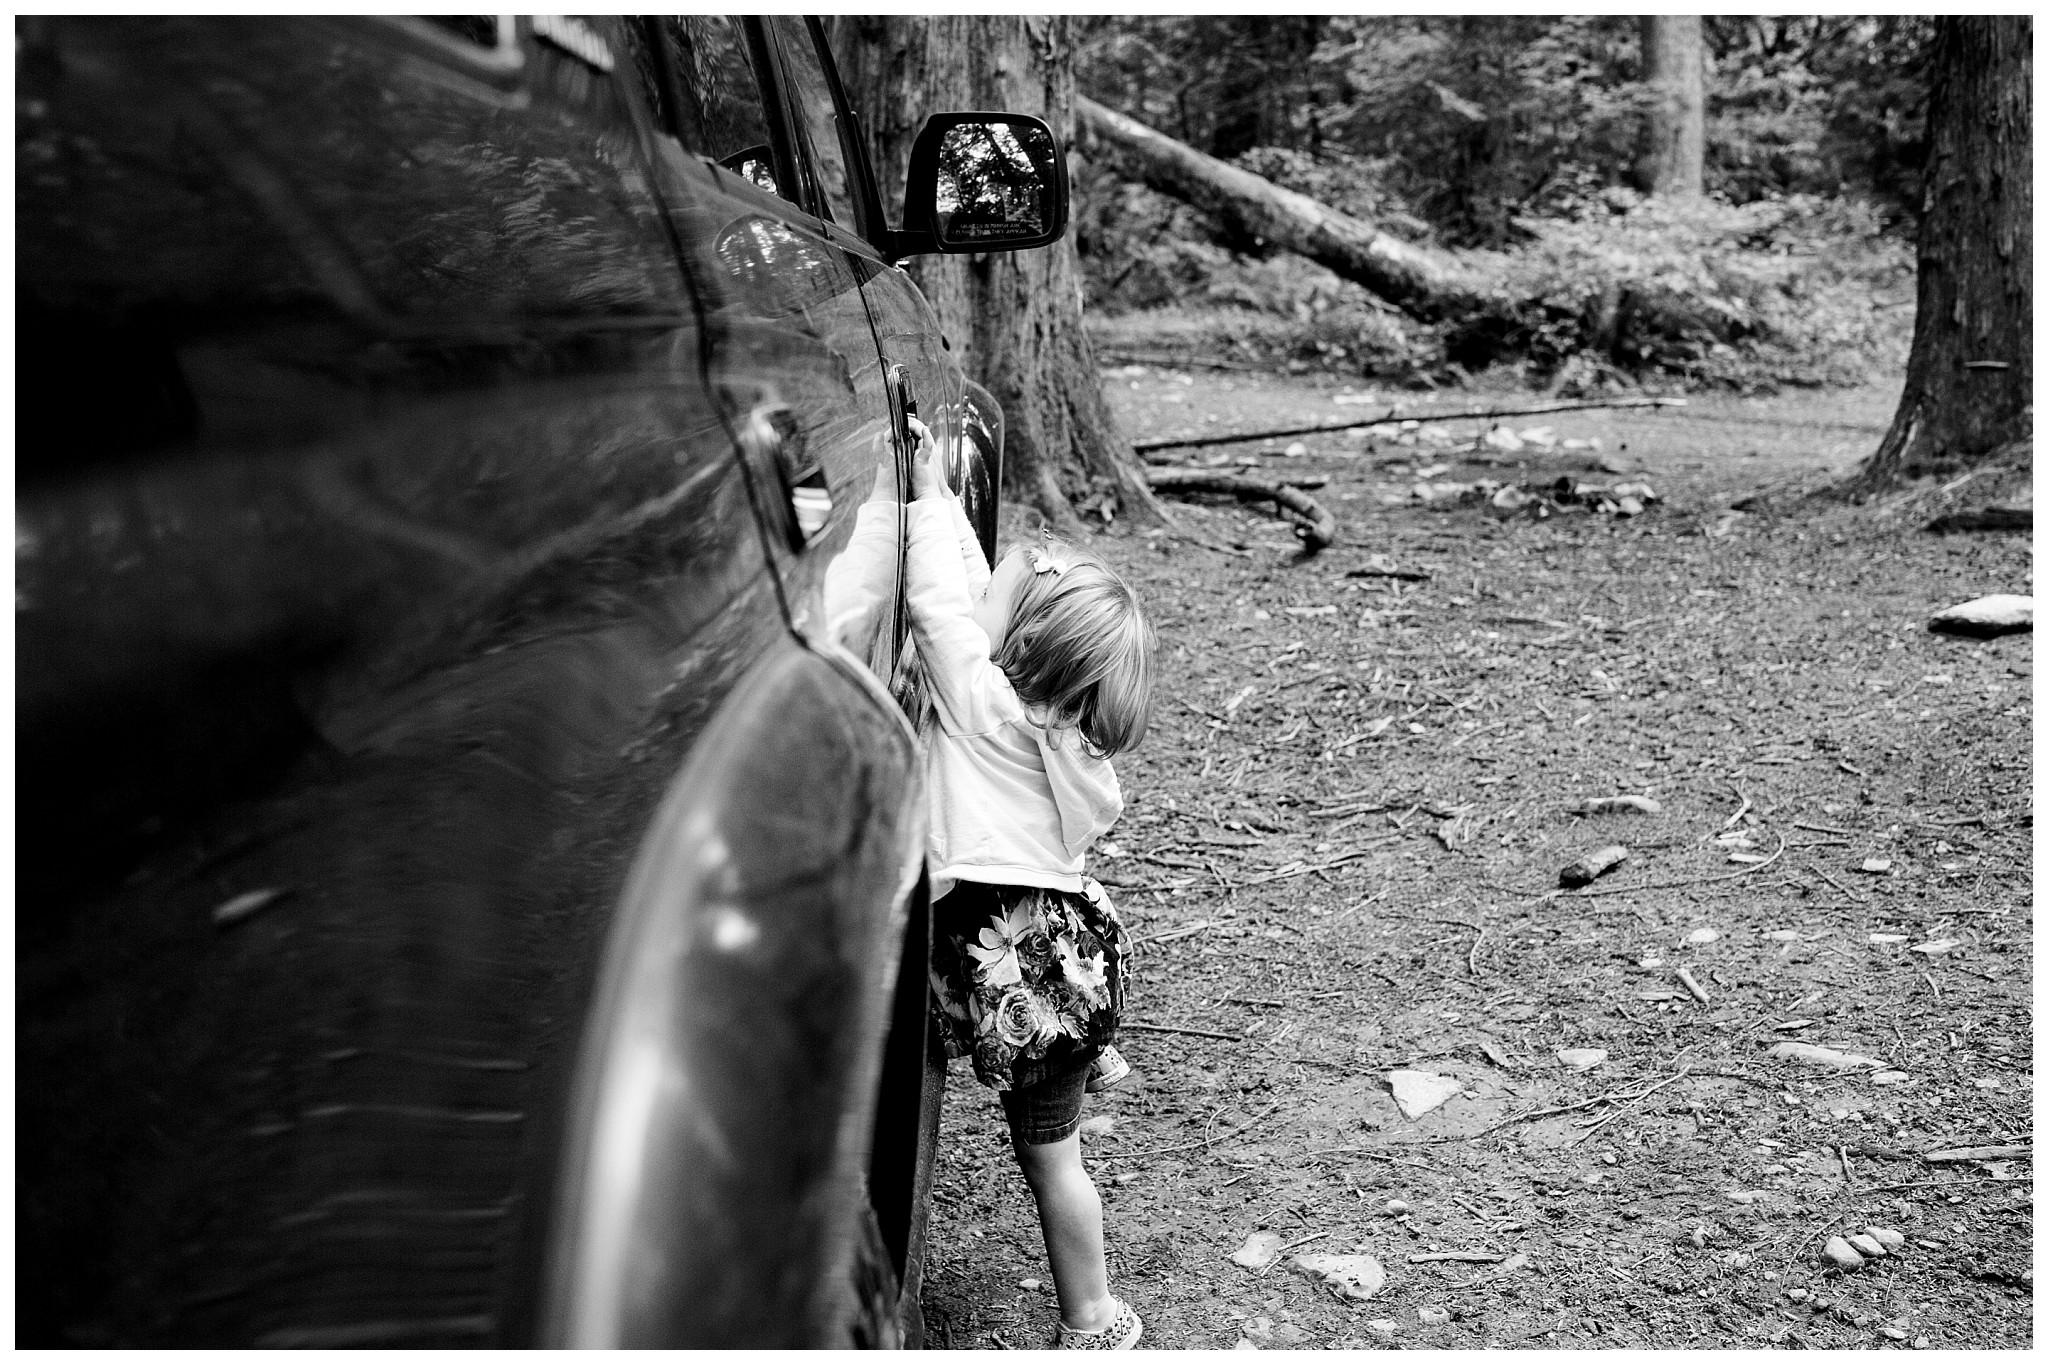 Mission Four Wheel Drive Family Adventure Photographer Toyota 4runner british columbia canada_0006.jpg